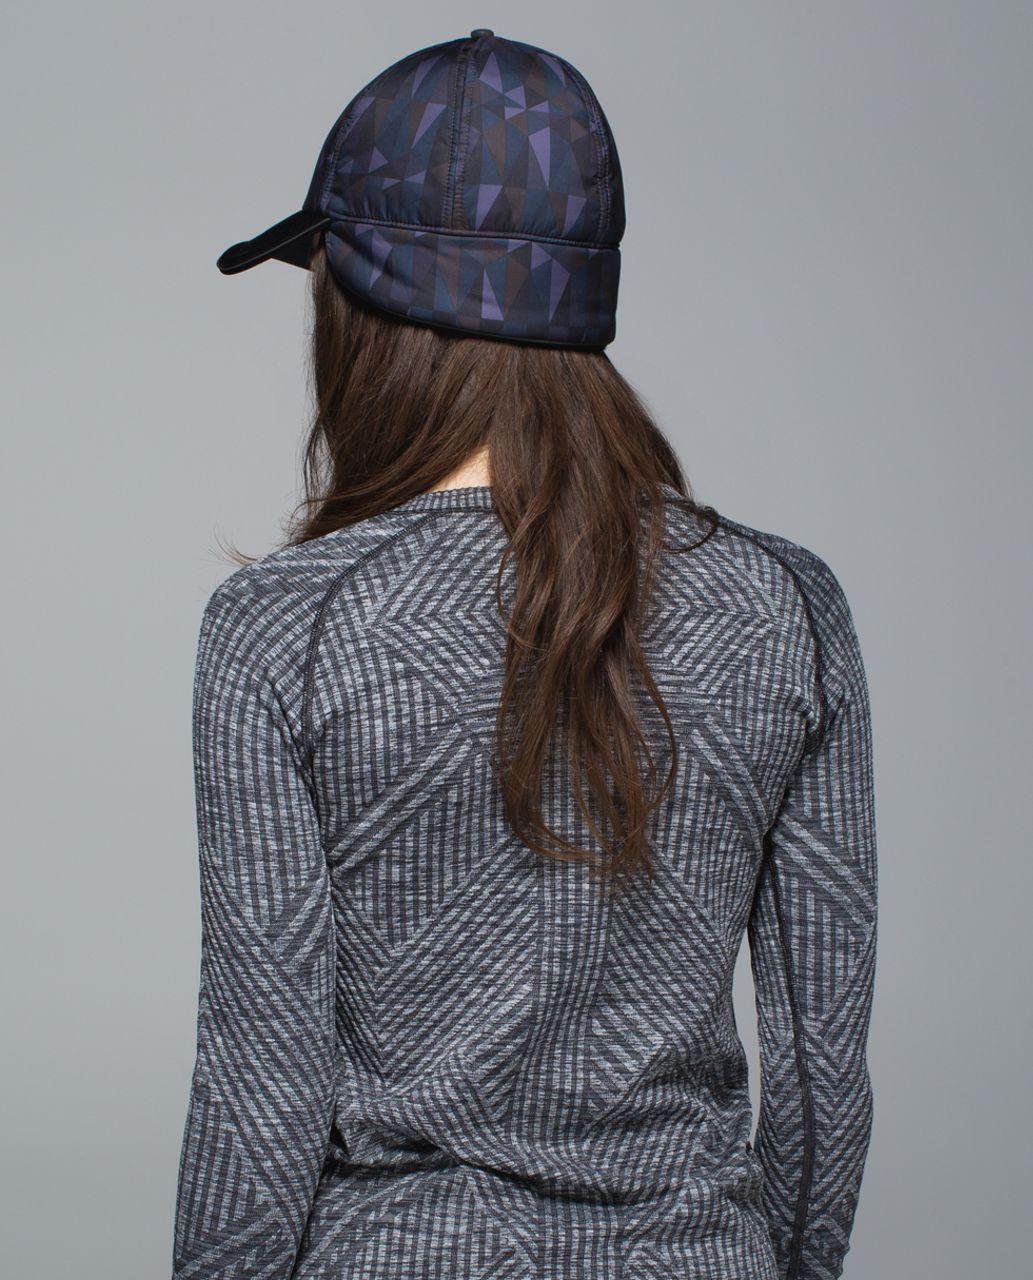 Lululemon Fluffed Up Run Hat - Stained Glass Love Nightfall Black / Black